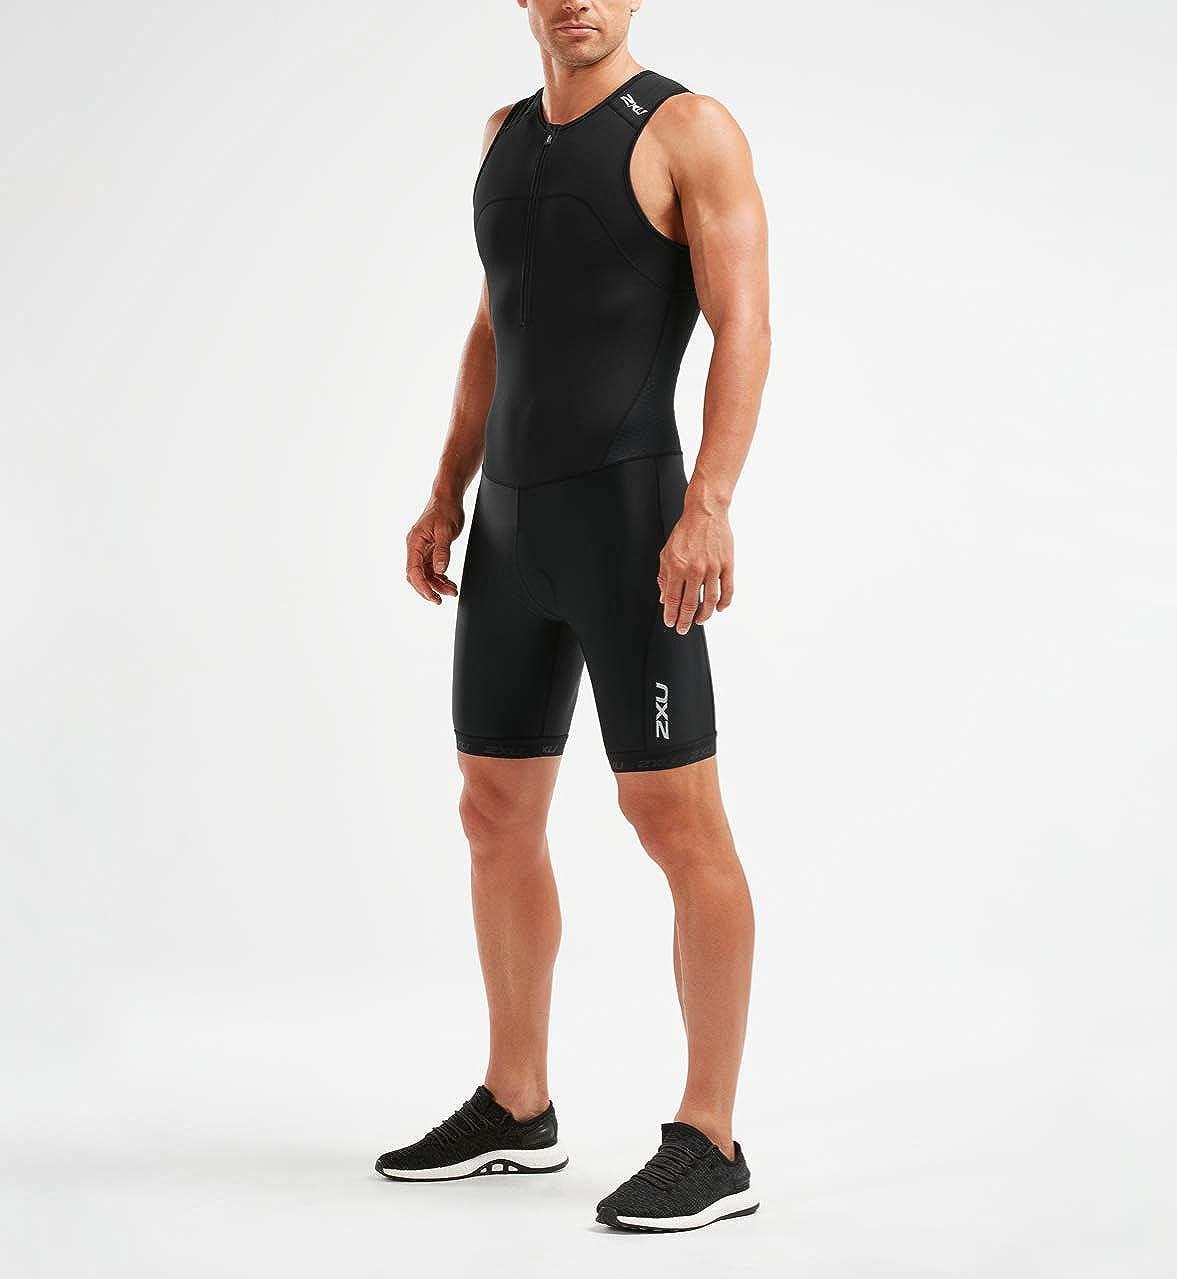 2XU Active Triathlon Suit-Mt5540d